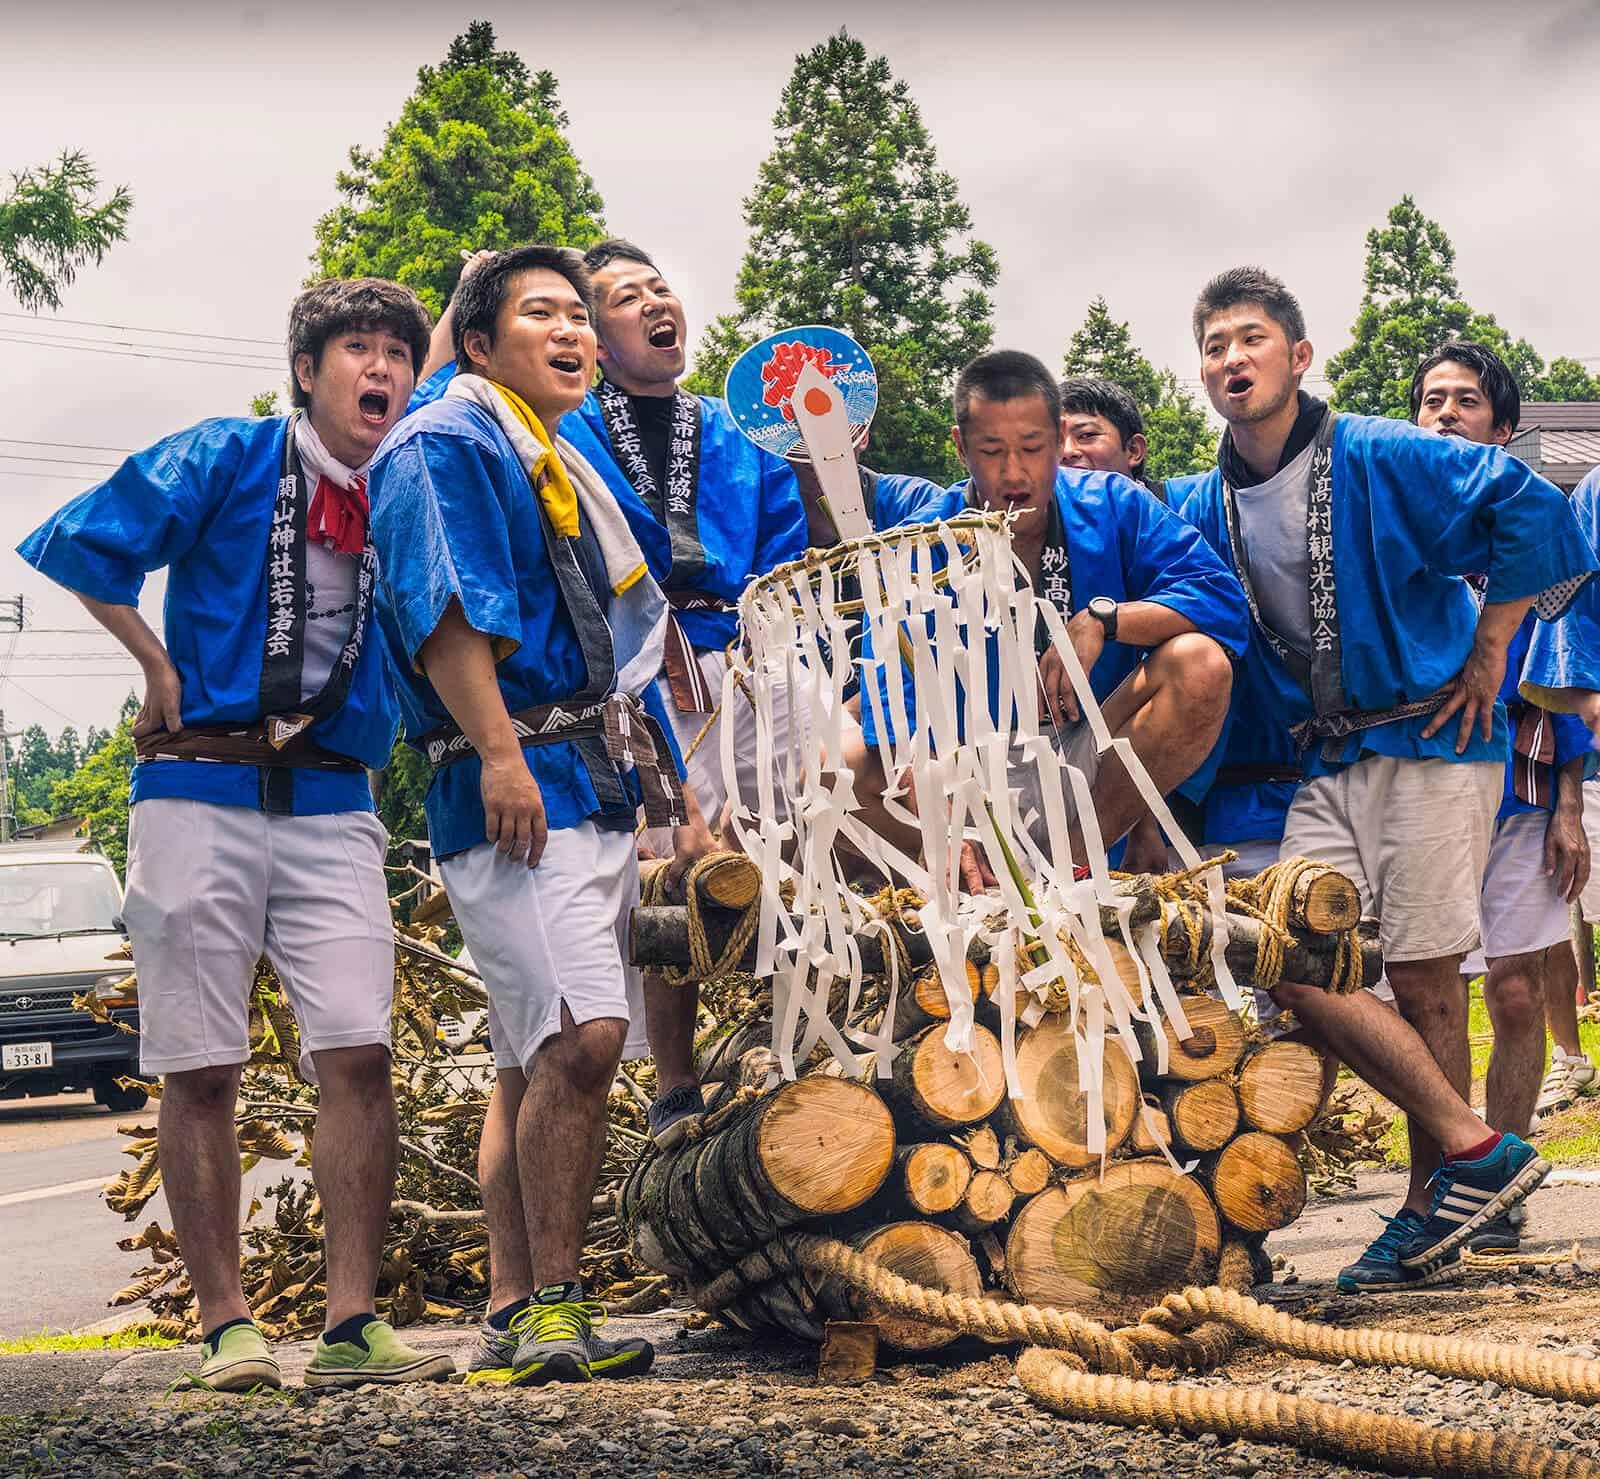 Sekiyama Fire Festival